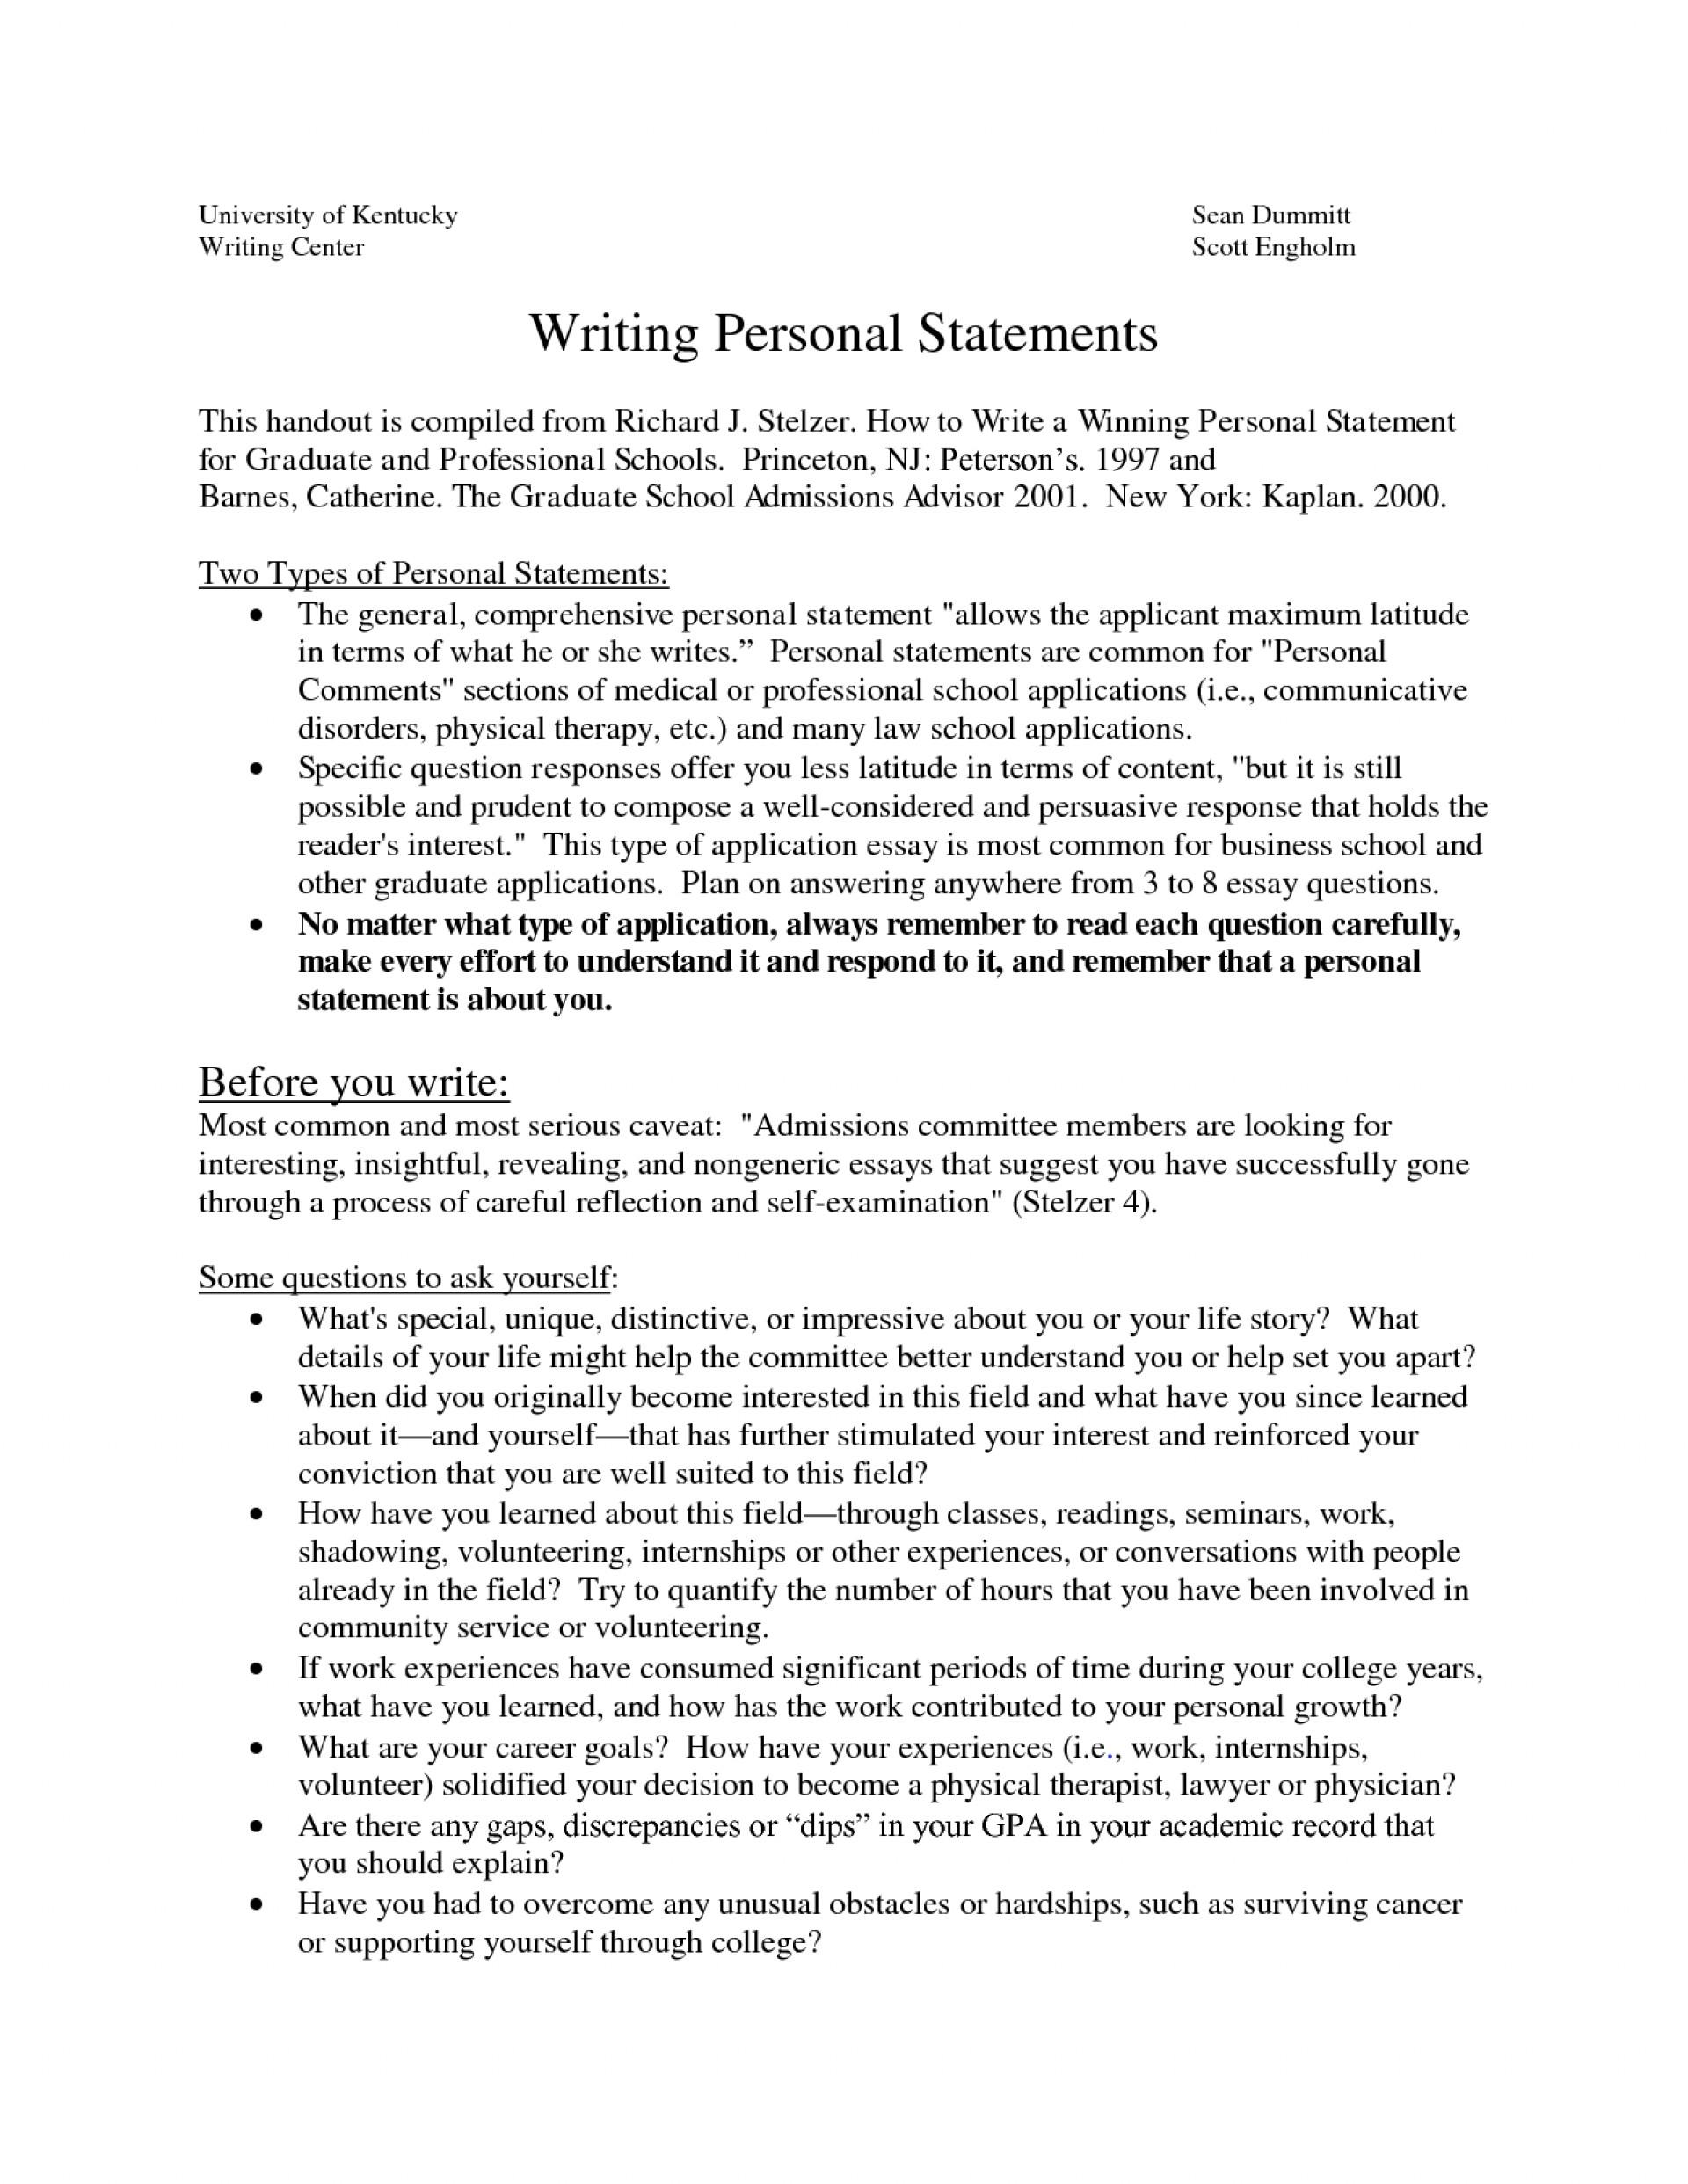 004 Essay Example Free Sample For Graduate School Formidable Admission Pdf 1920